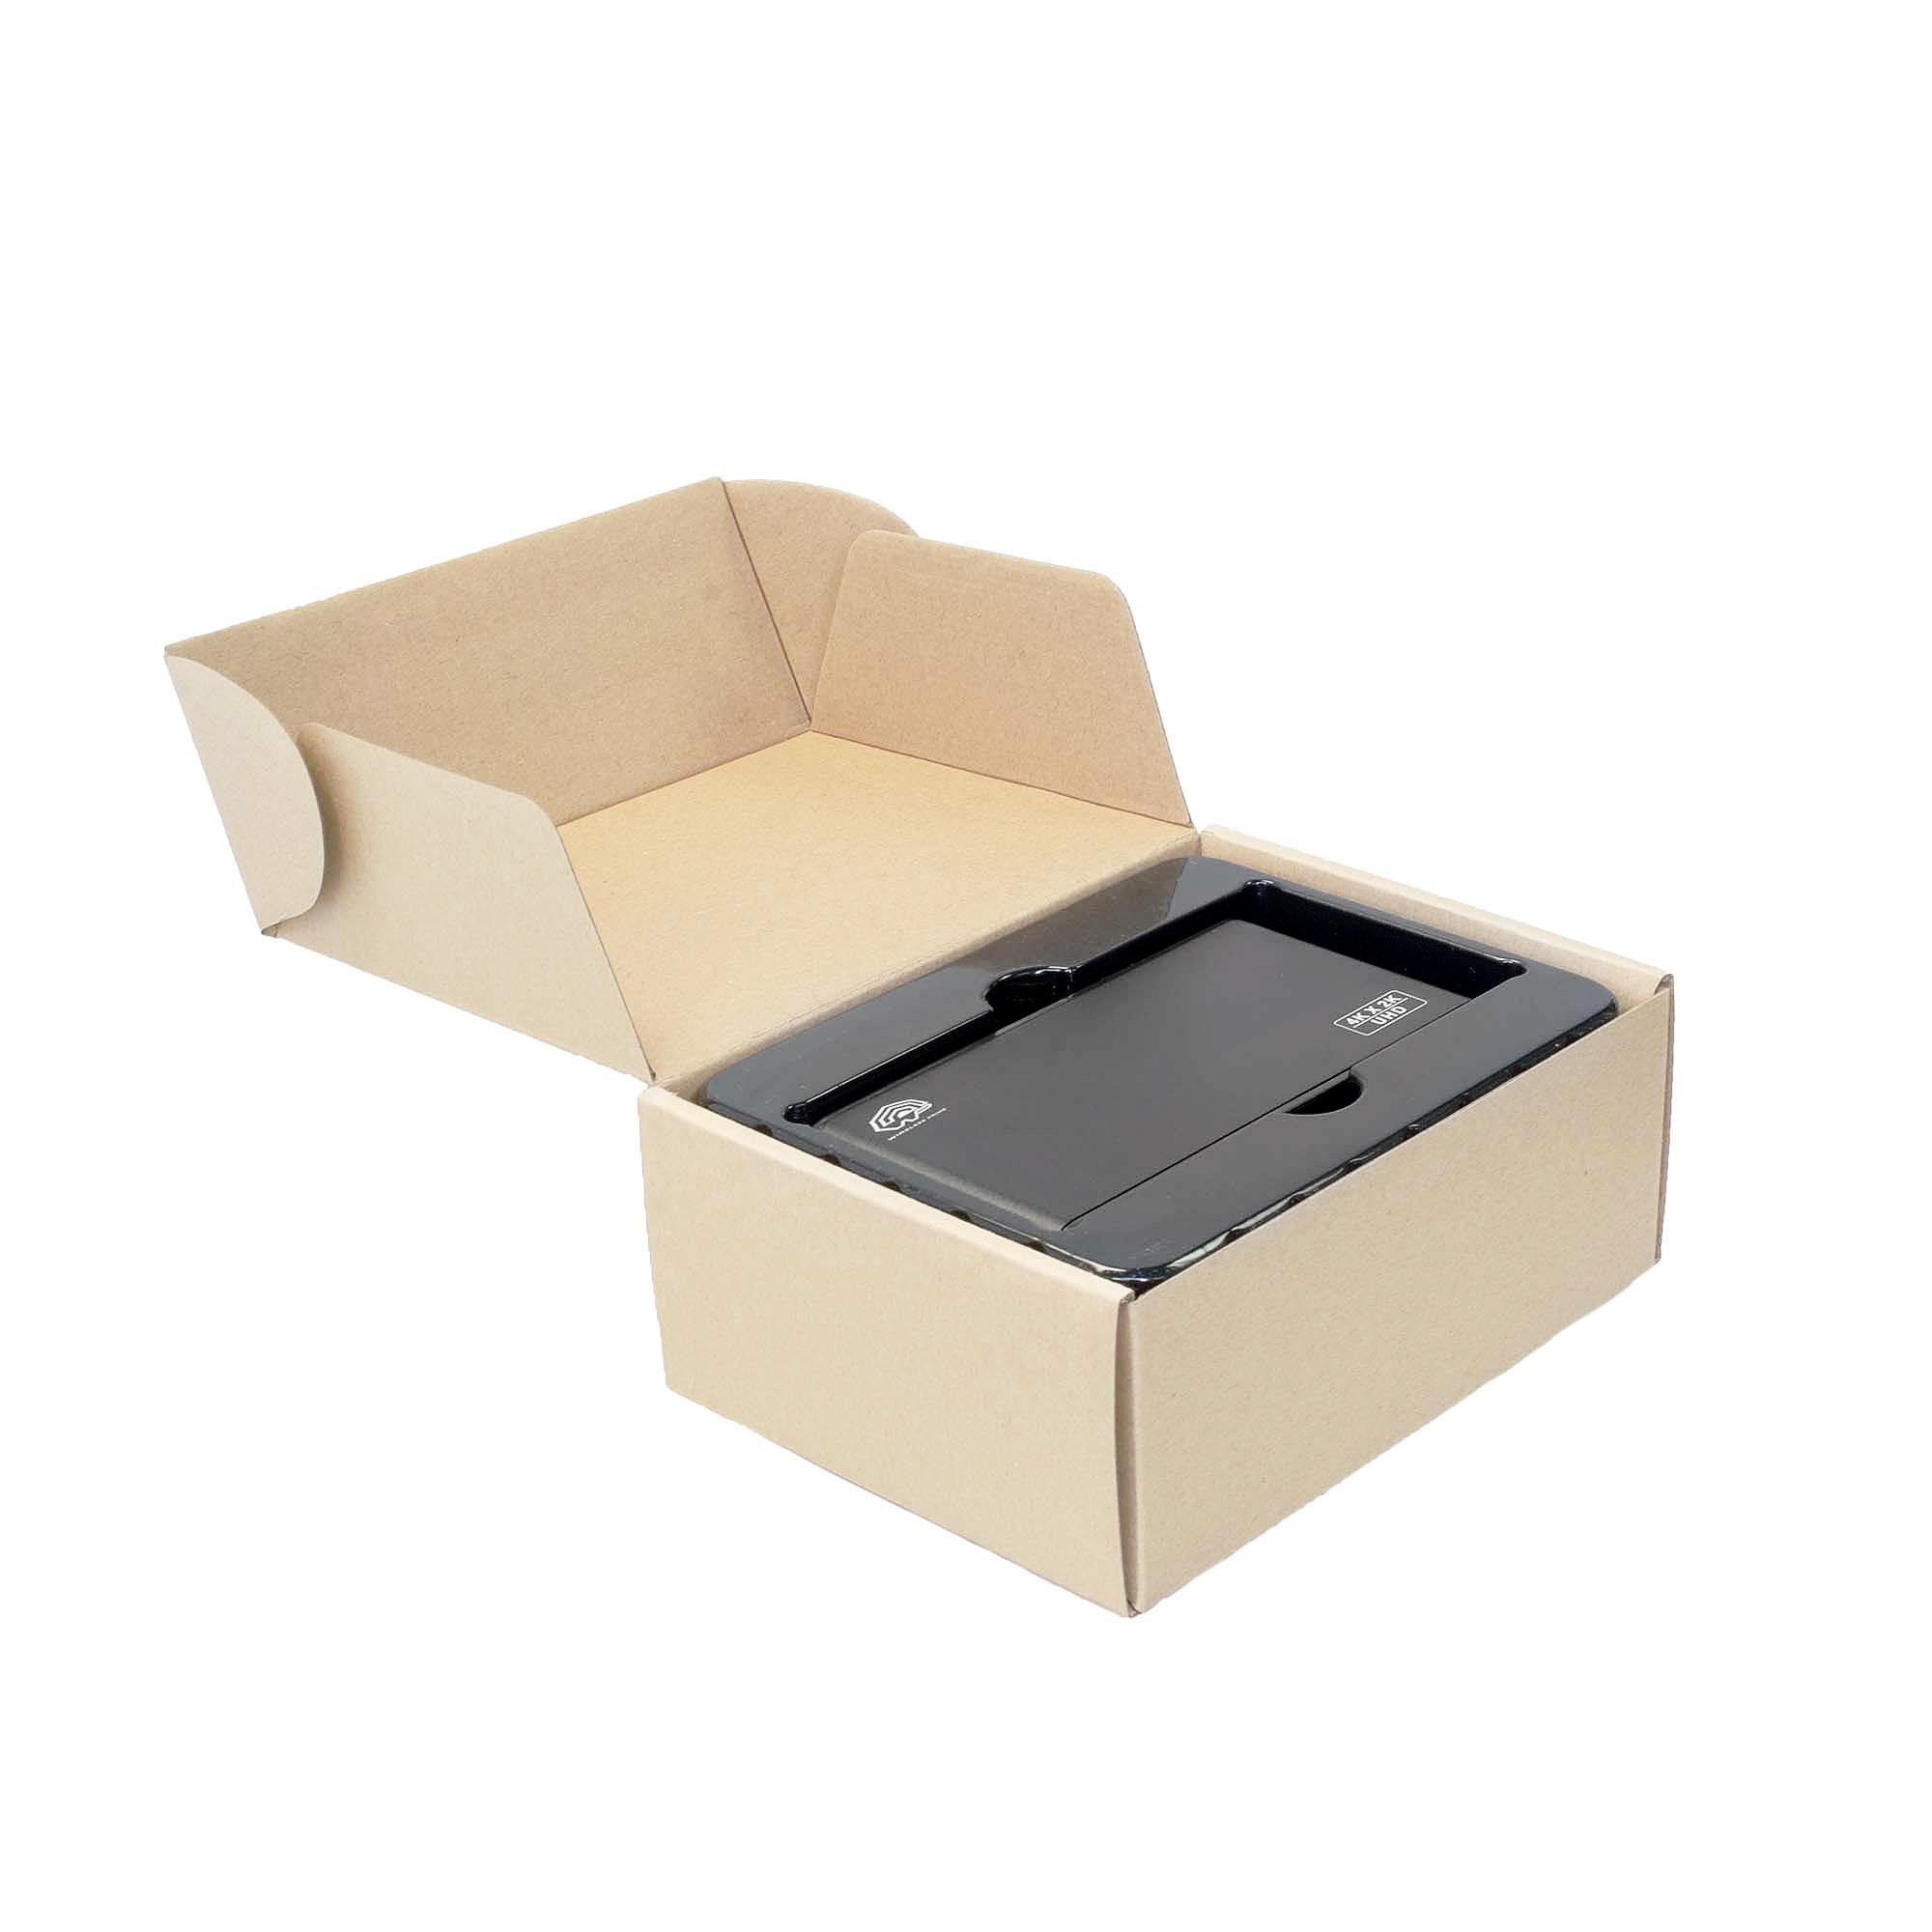 1x4_HDMI_Splitter_OpenBox